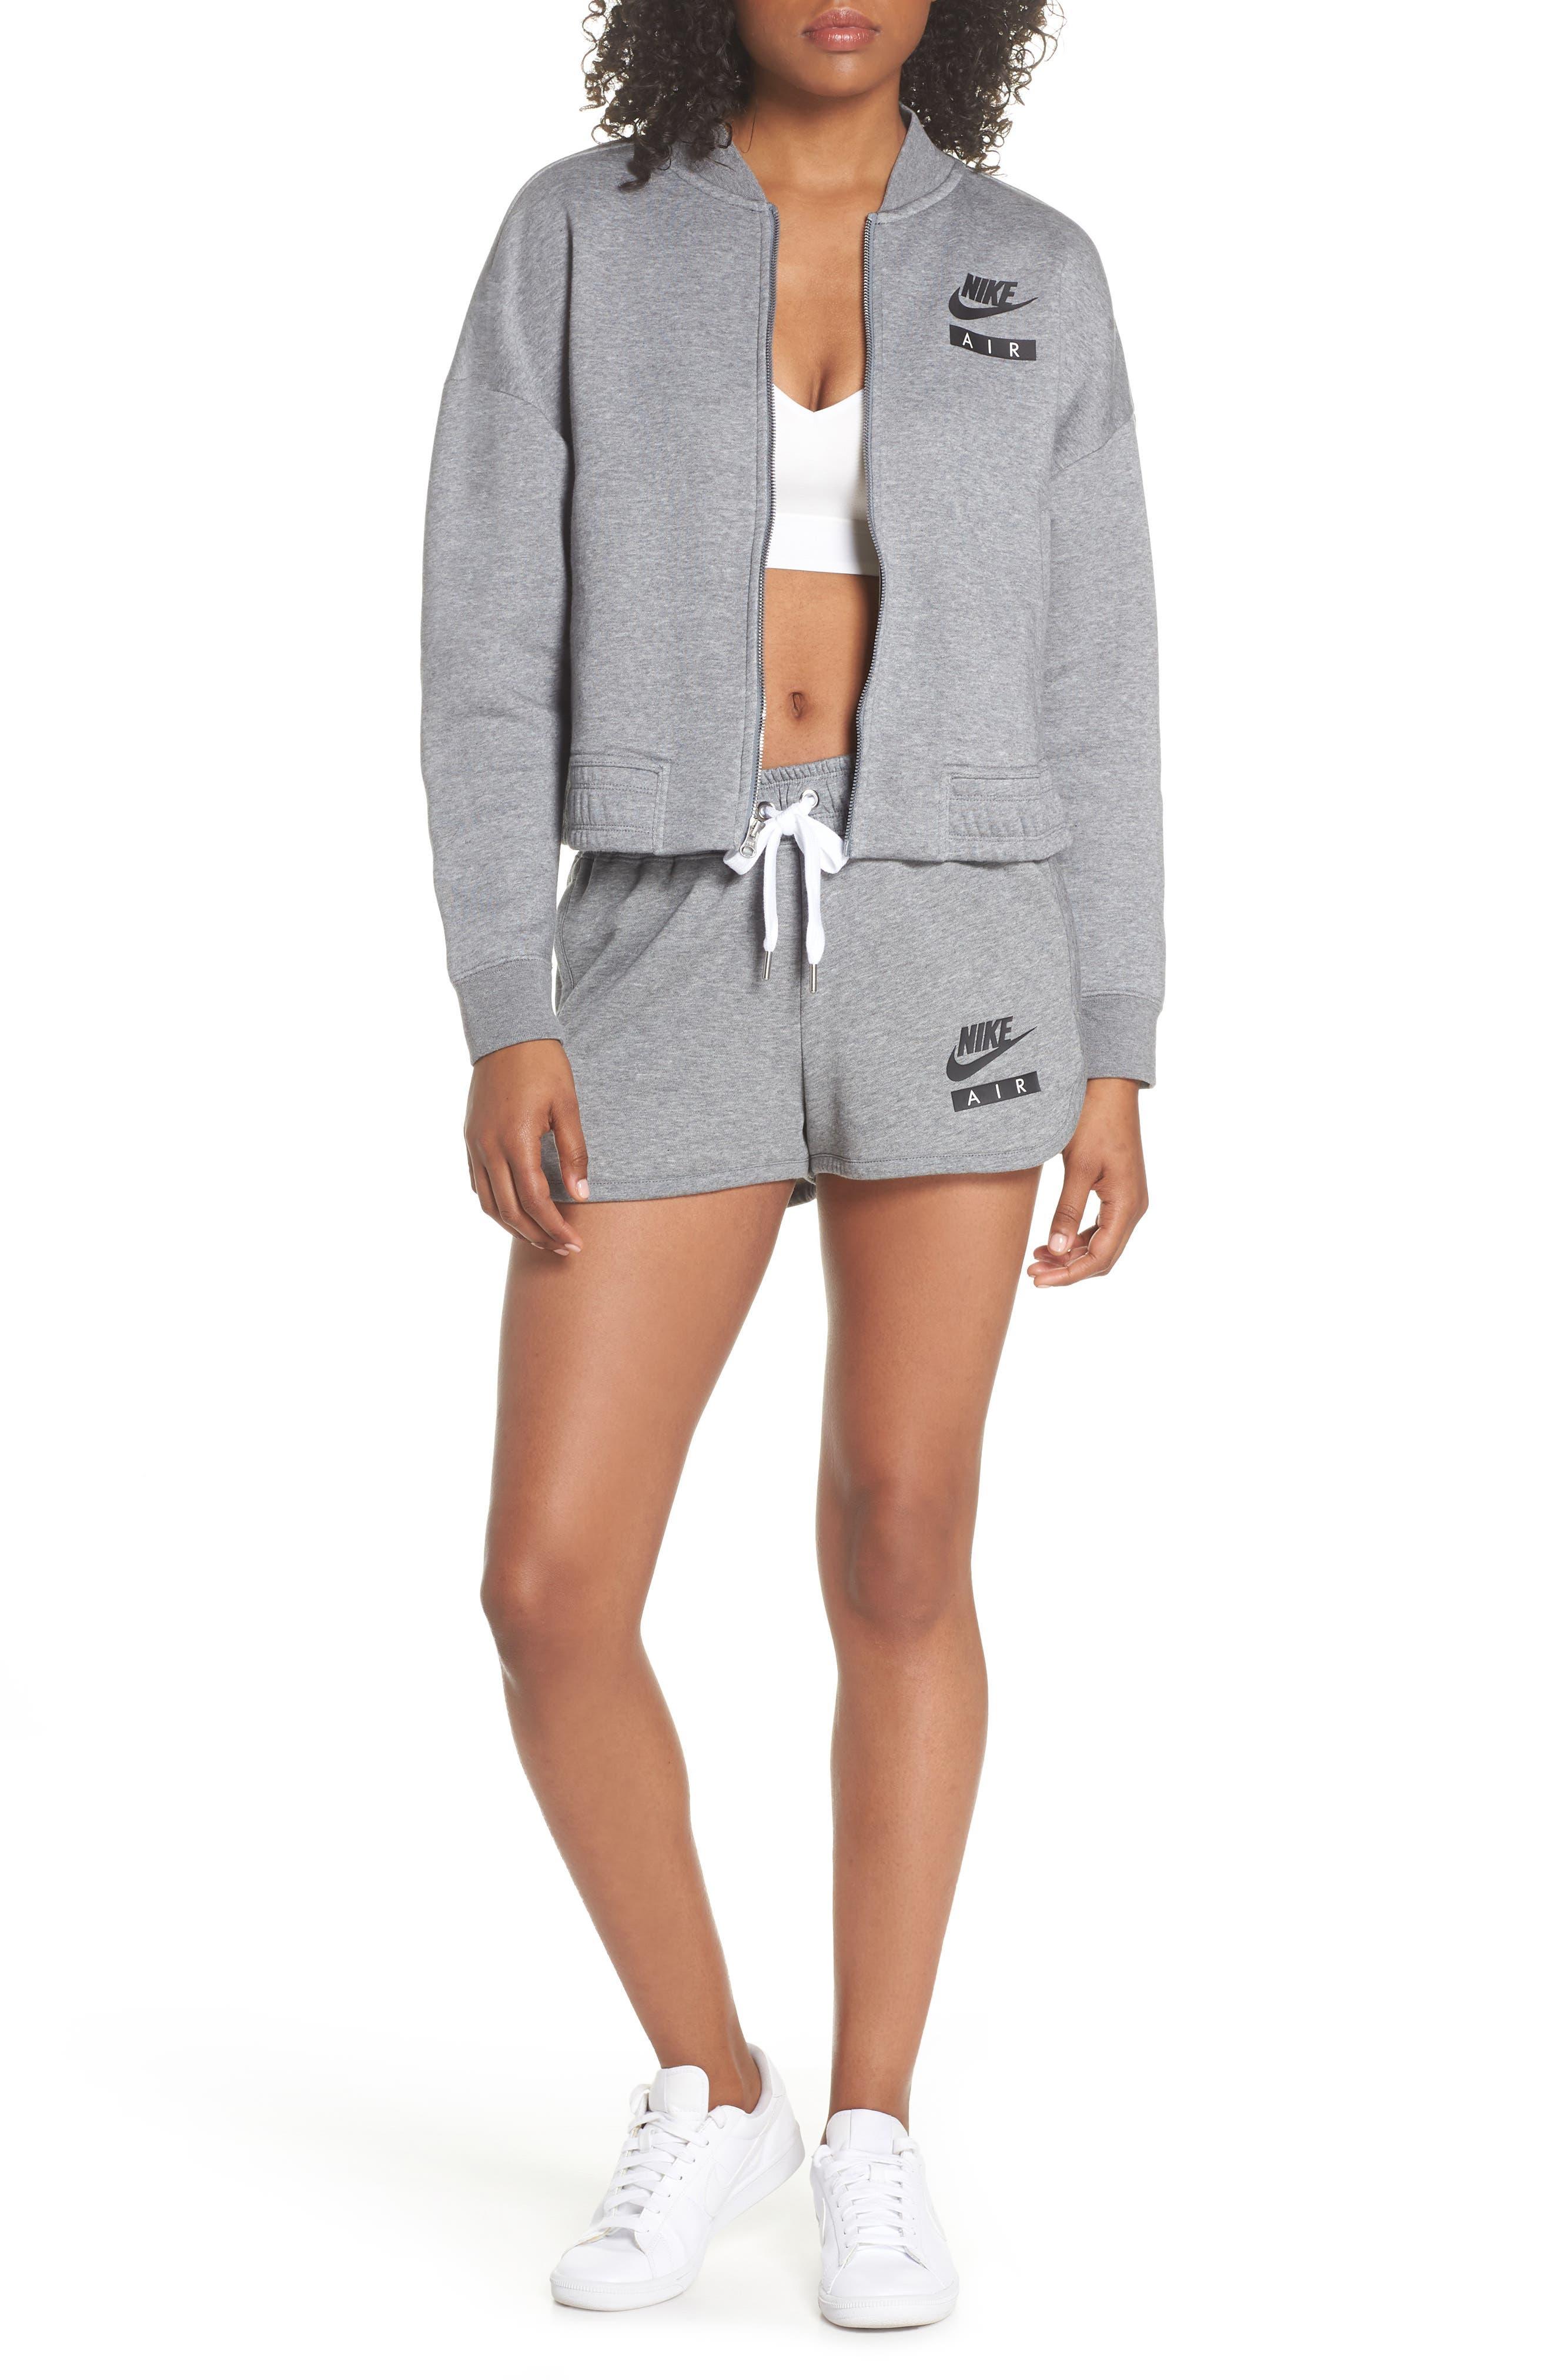 Sportswear Air Gym Shorts,                             Alternate thumbnail 6, color,                             Carbon Heather/ White/ Black